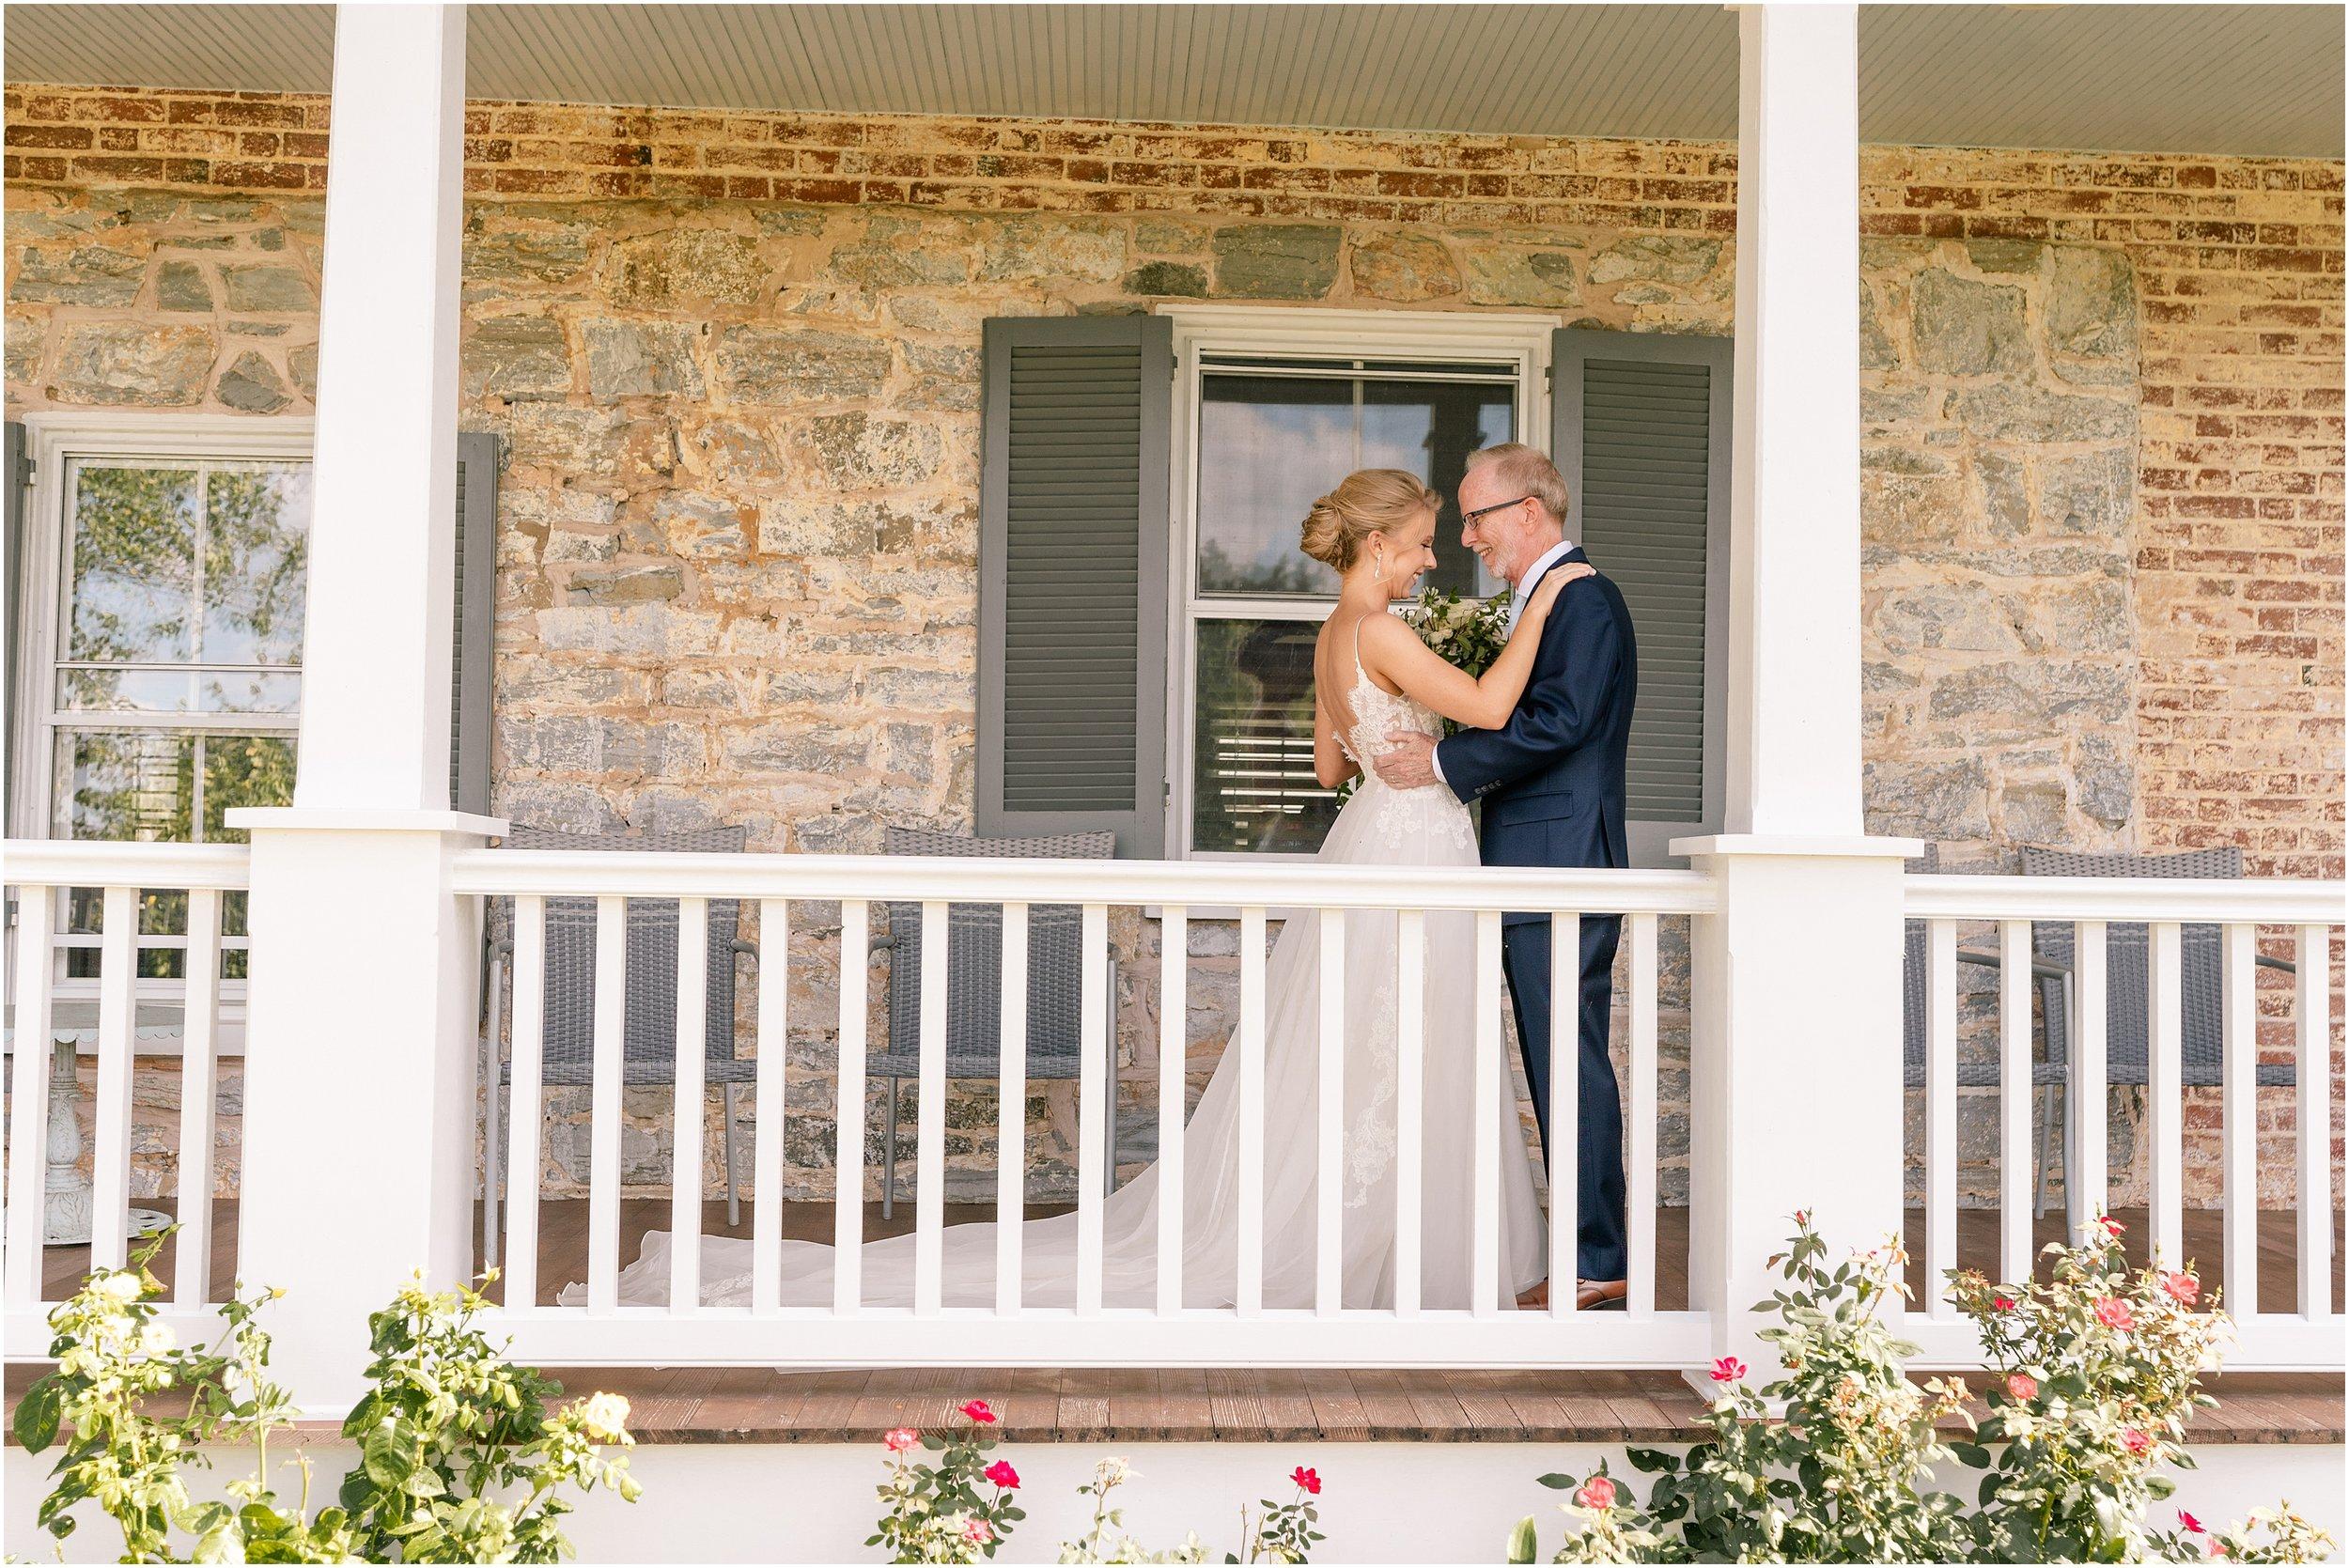 hannah leigh photography Walkers Overlook Wedding Walkersville MD_3587.jpg